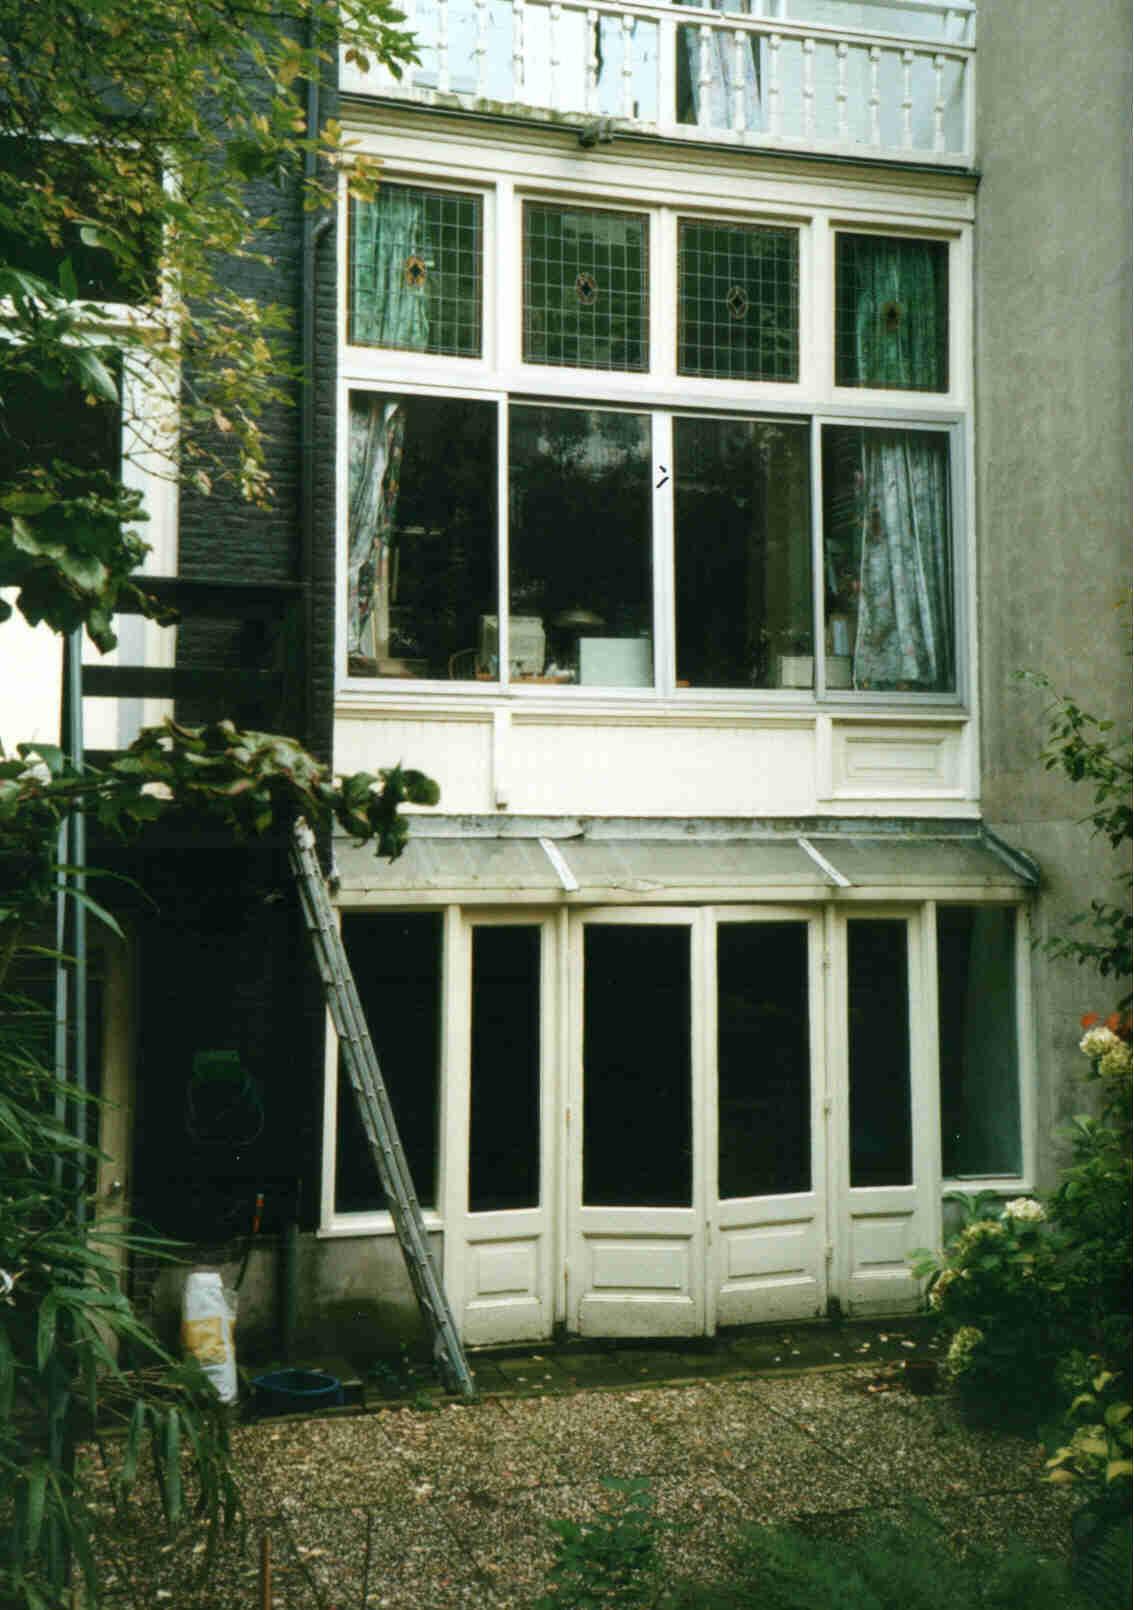 1998-09-11 NWkade foto - 01.jpg